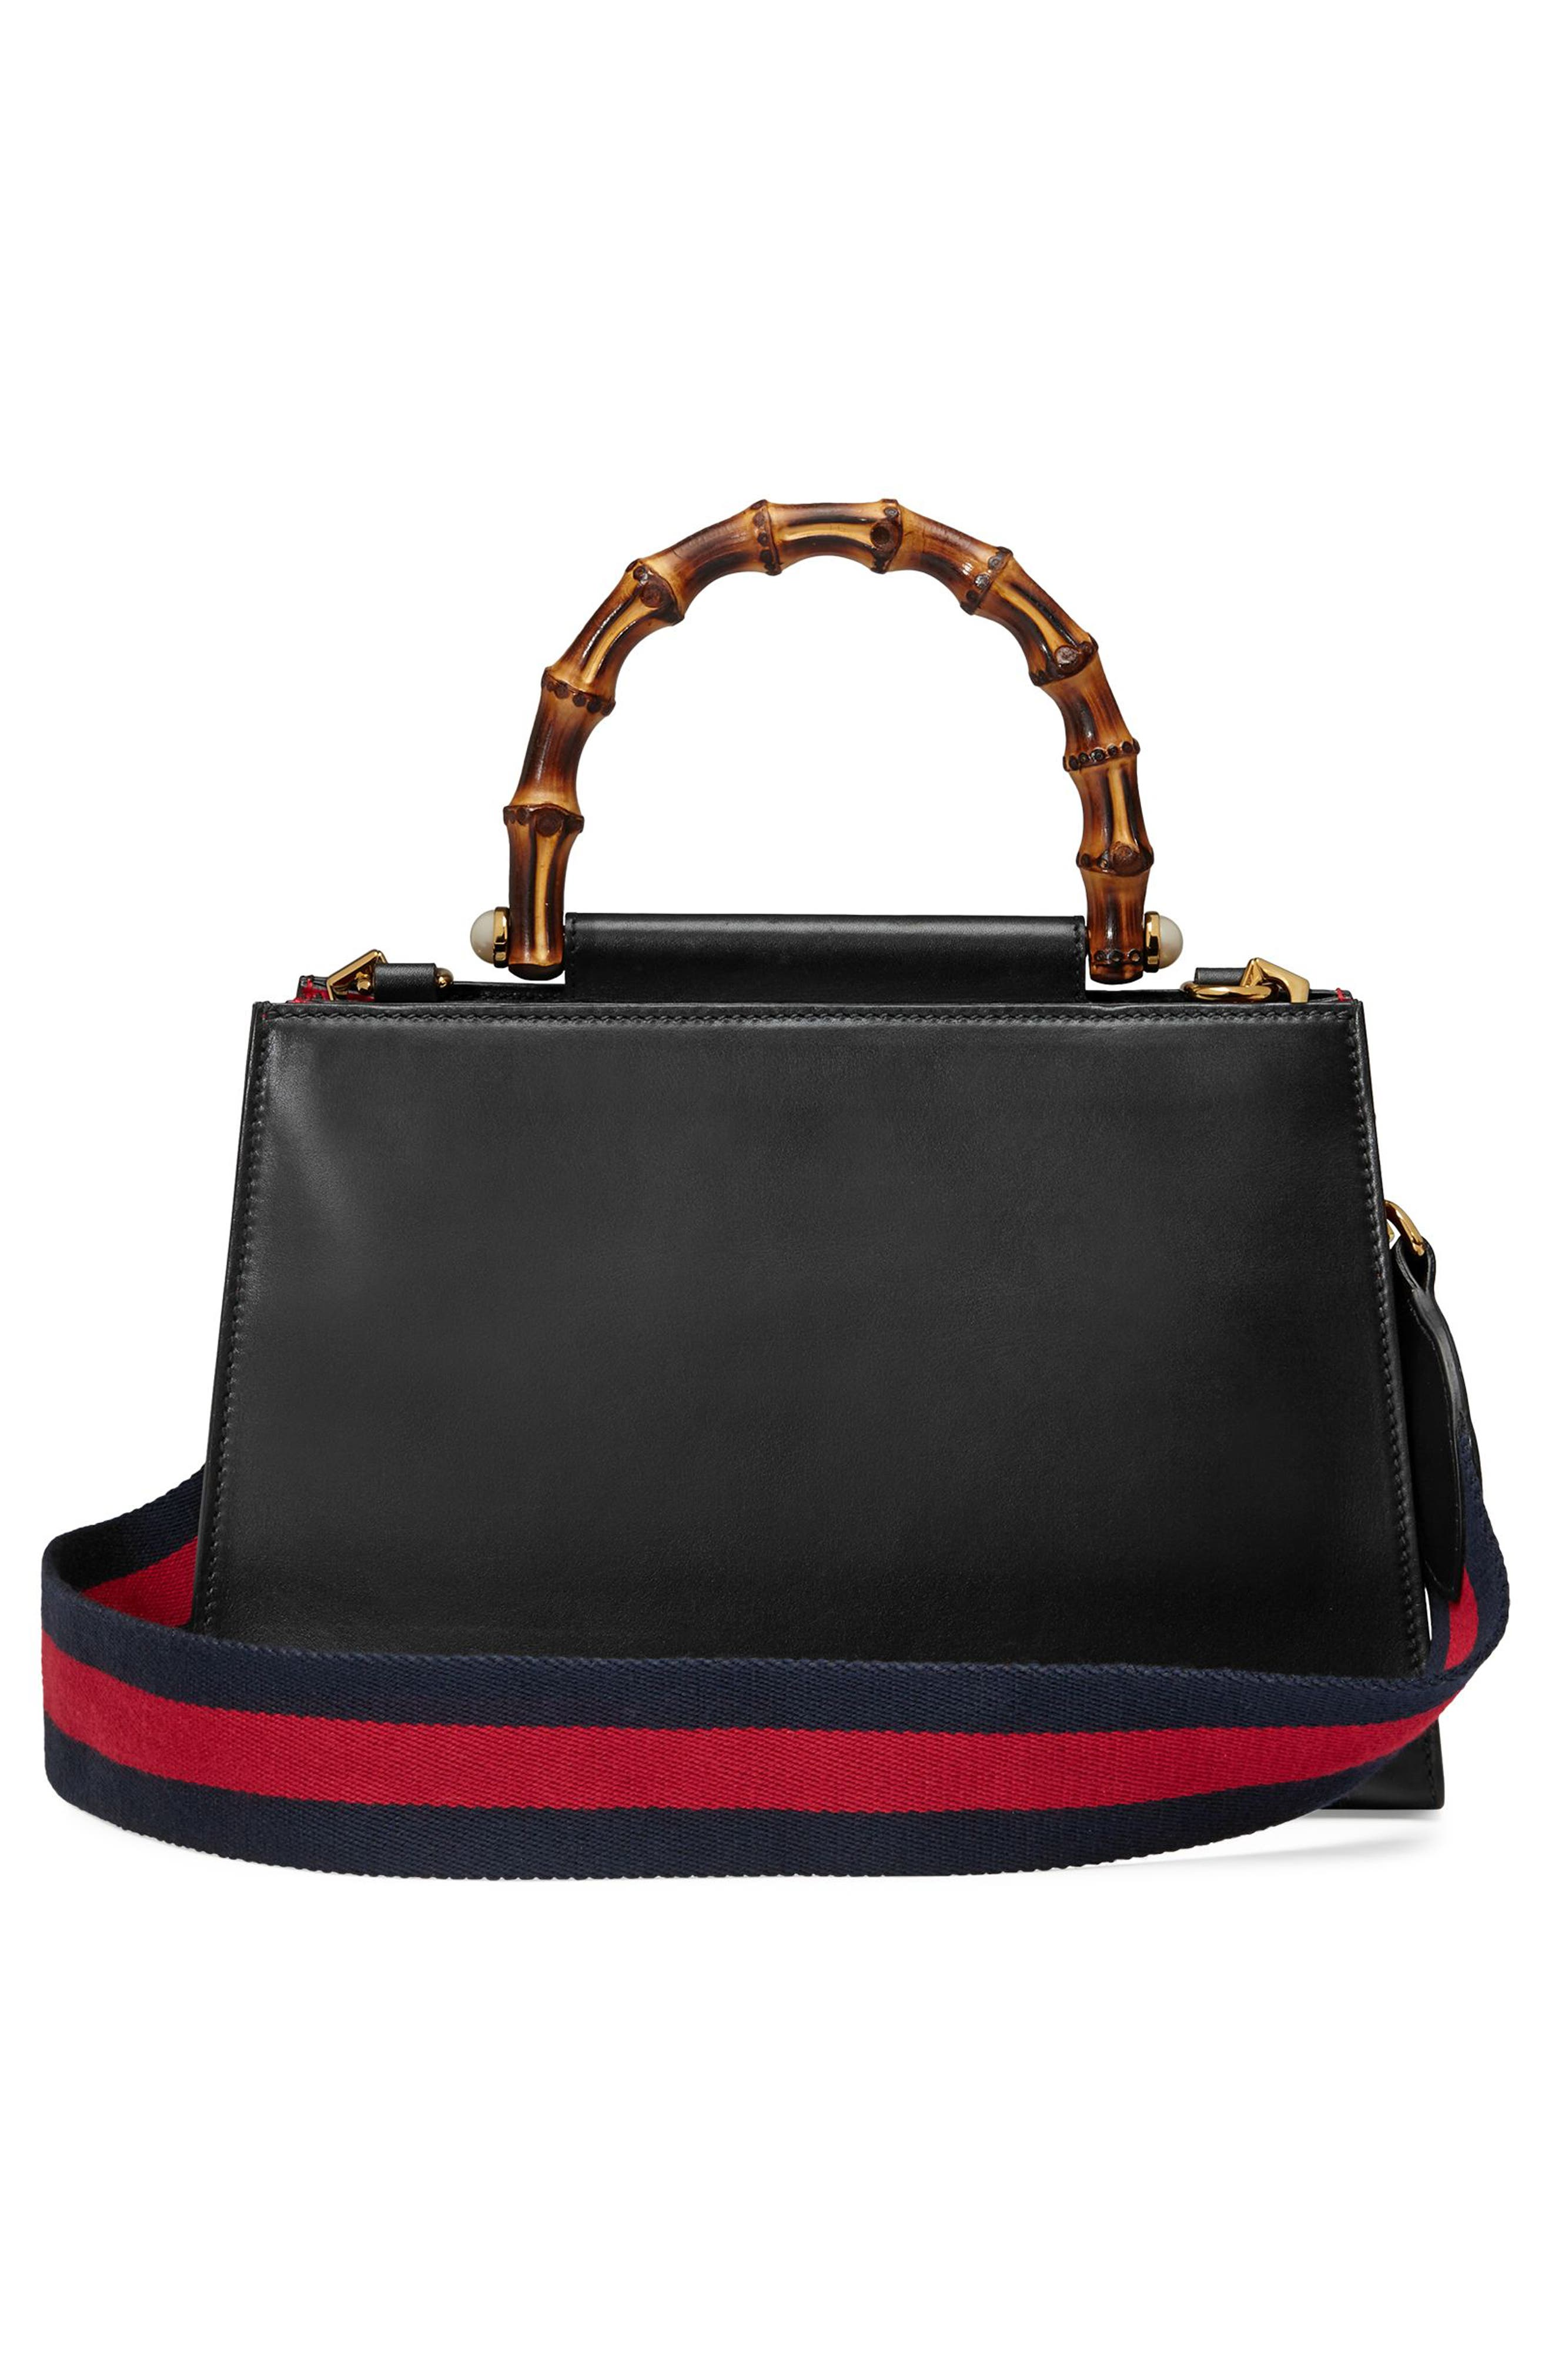 Alternate Image 2  - Gucci Medium Nymphea Bicolor Leather Top Handle Satchel